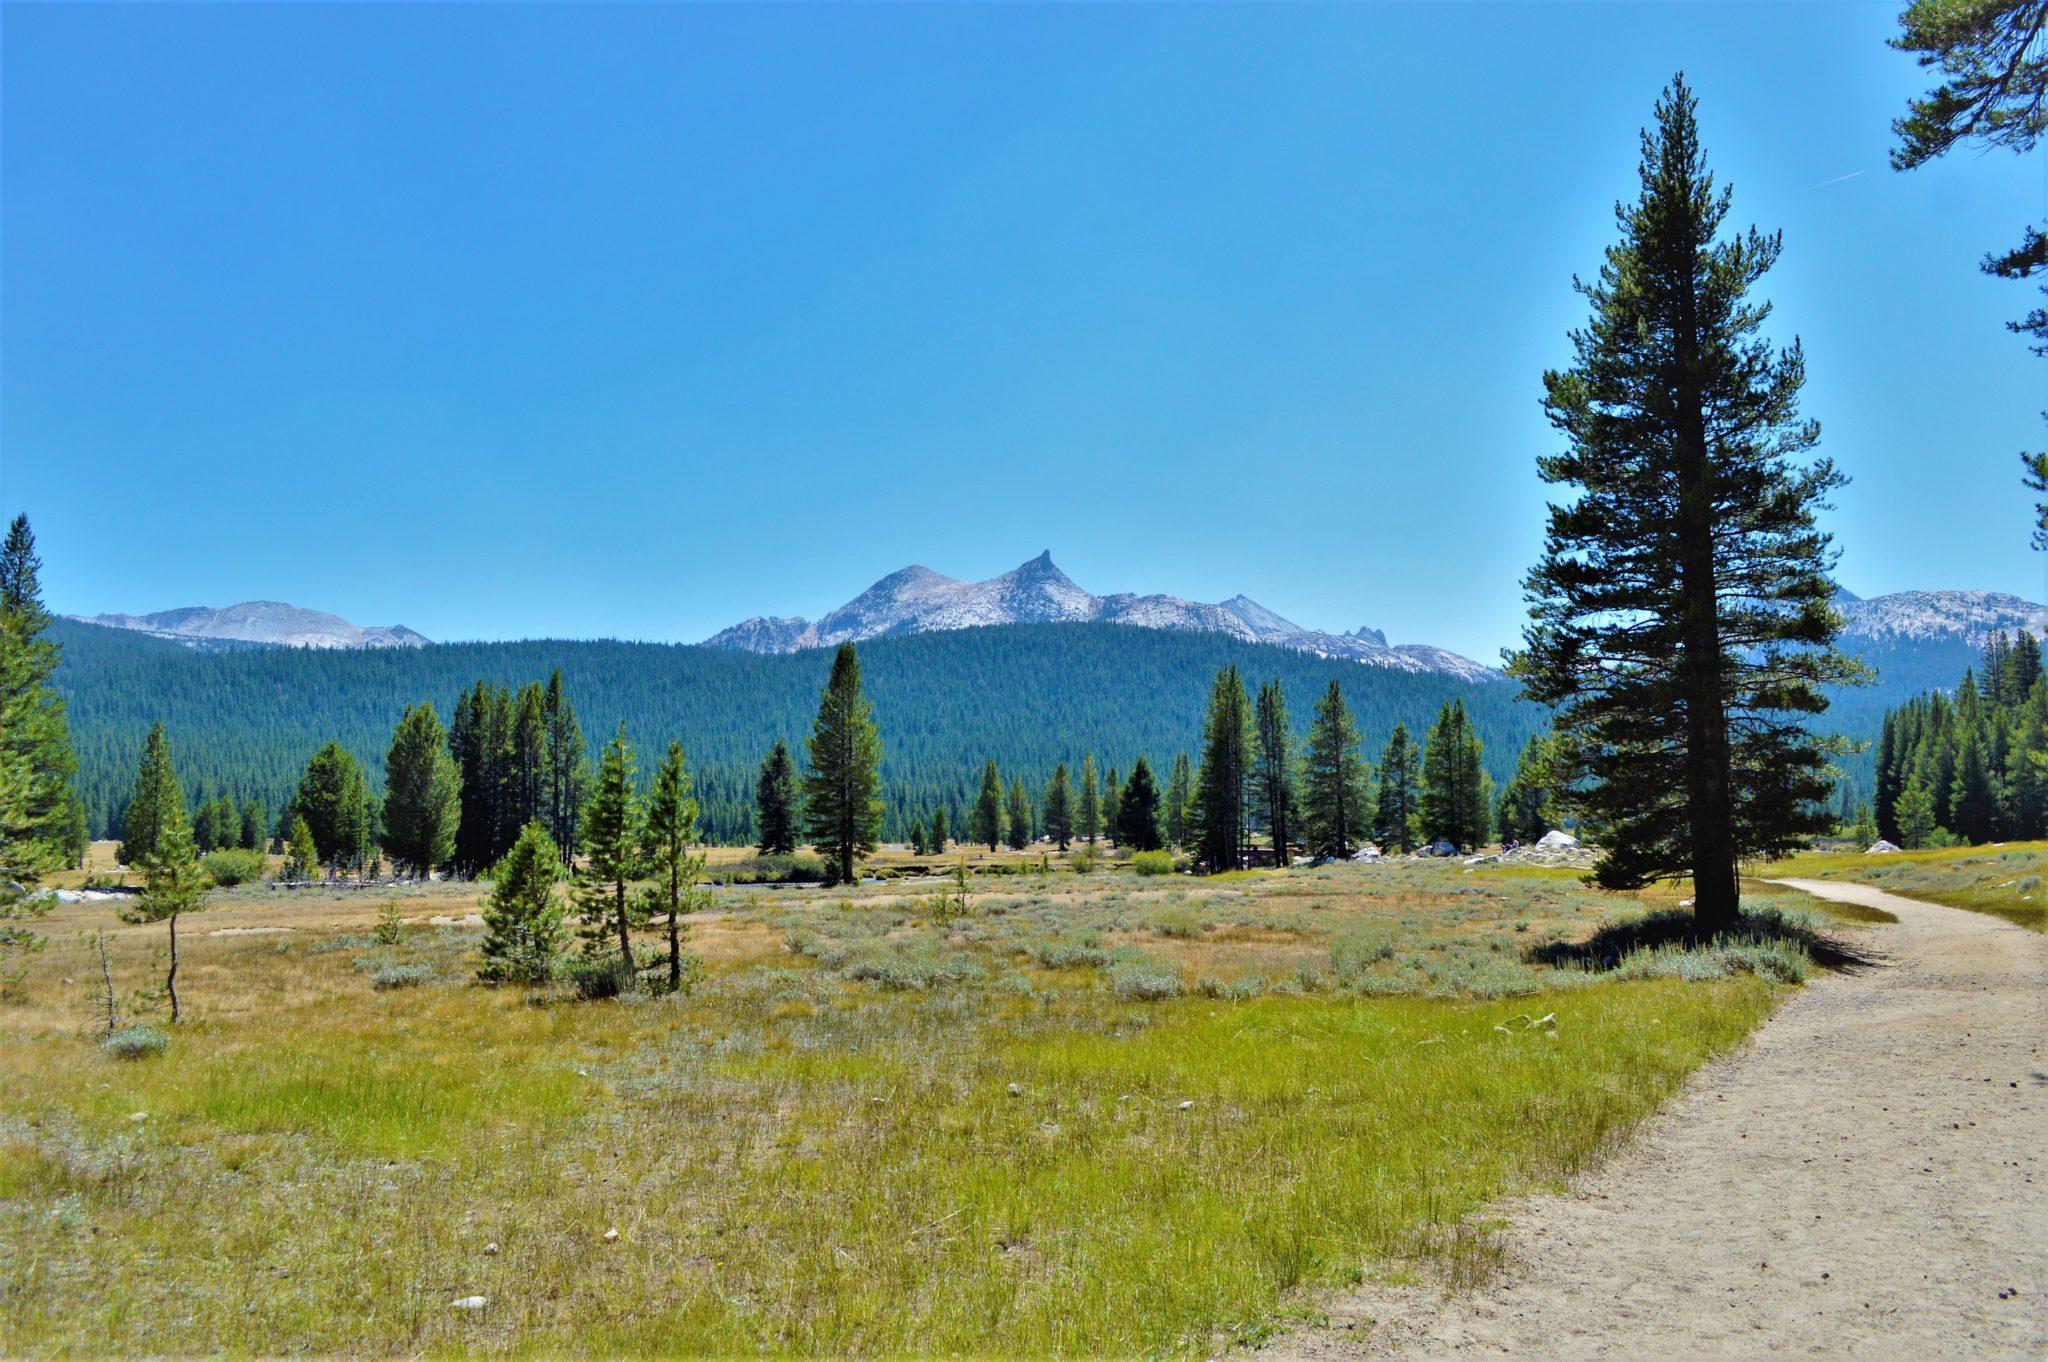 PCT Pacific Crest Trail, Yosemite National Park, California